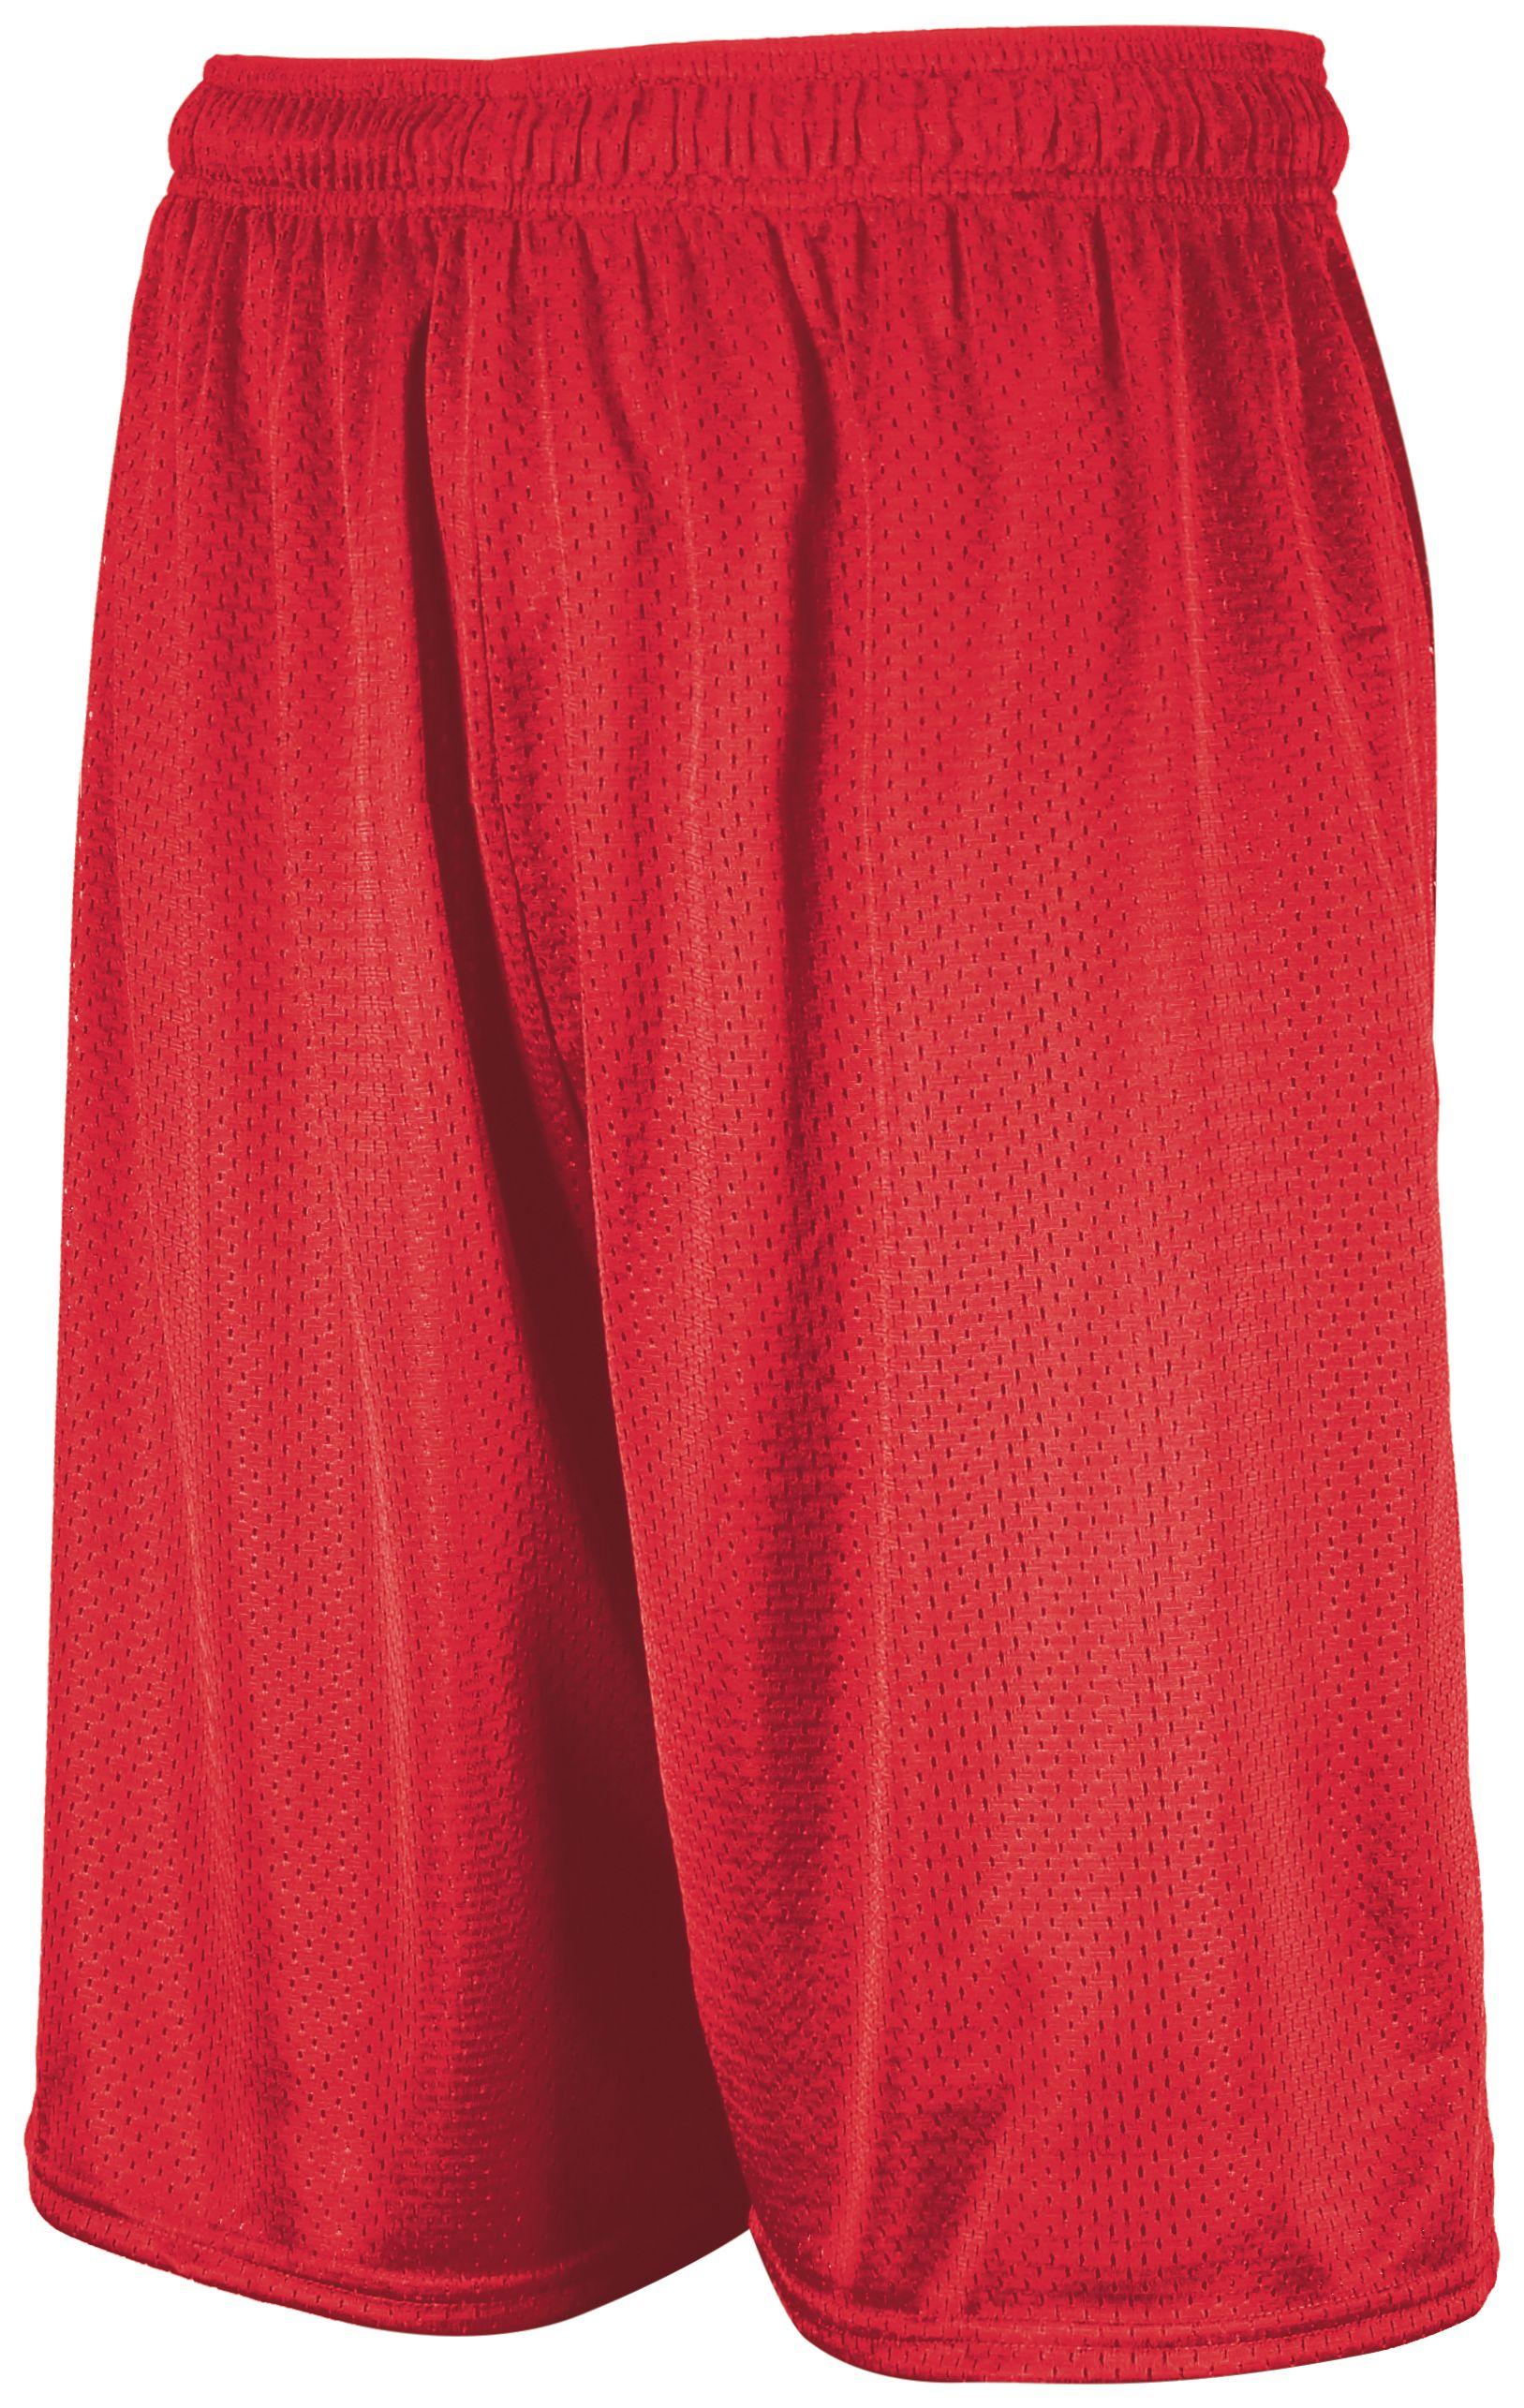 Dri-Power Mesh Shorts - True Red